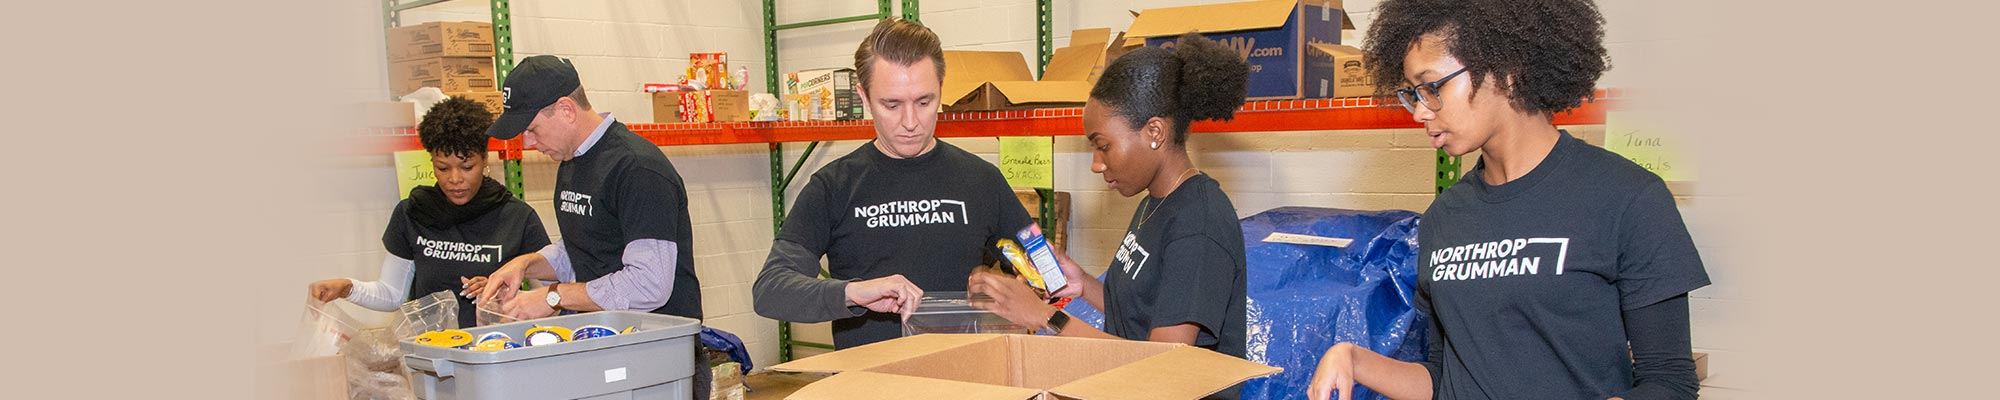 employees volunteering at a food bank